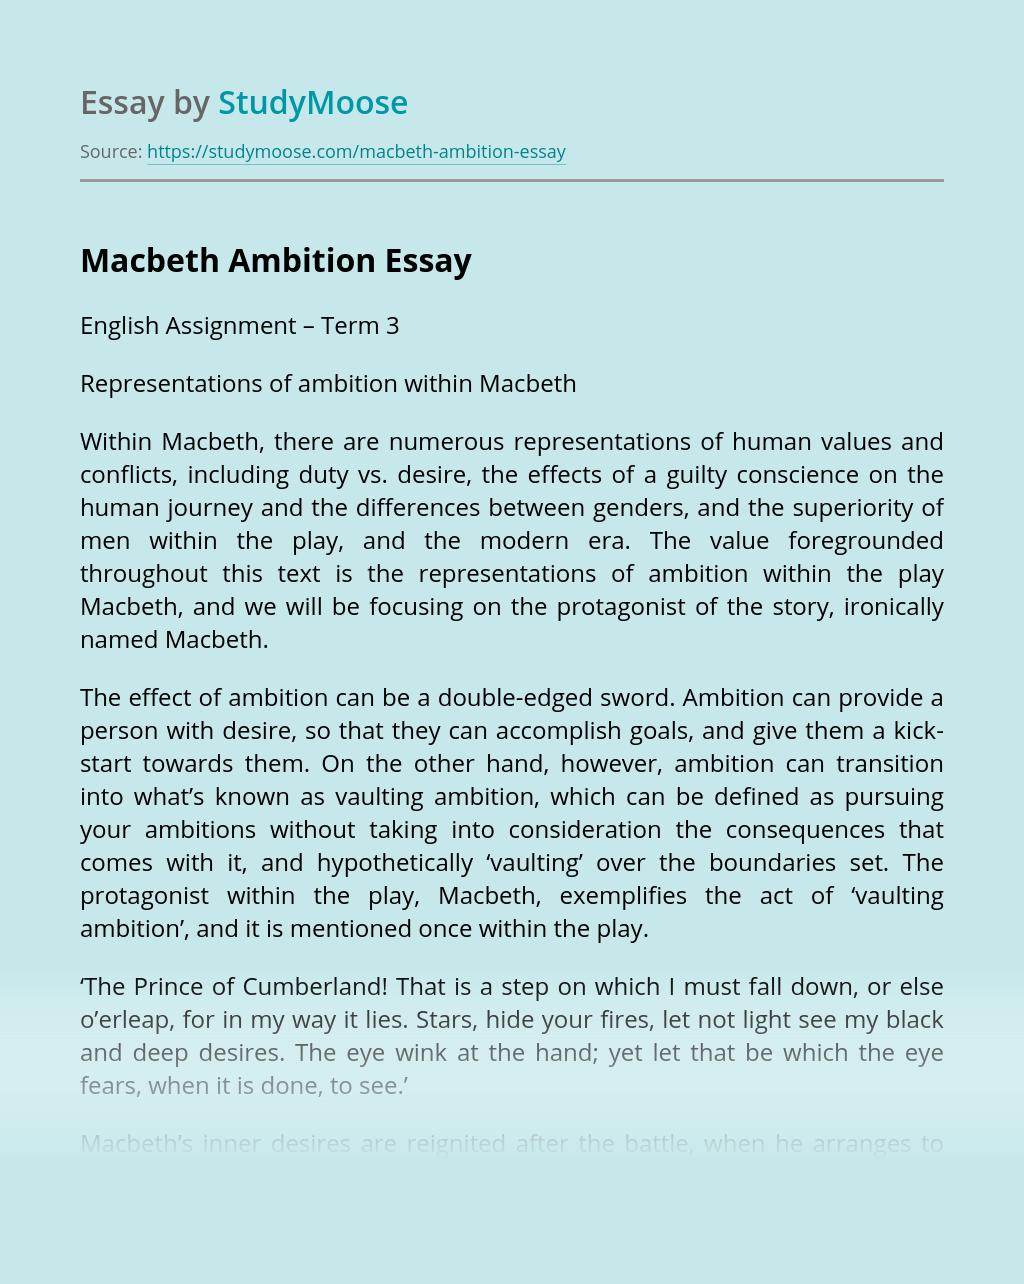 Macbeth Ambition